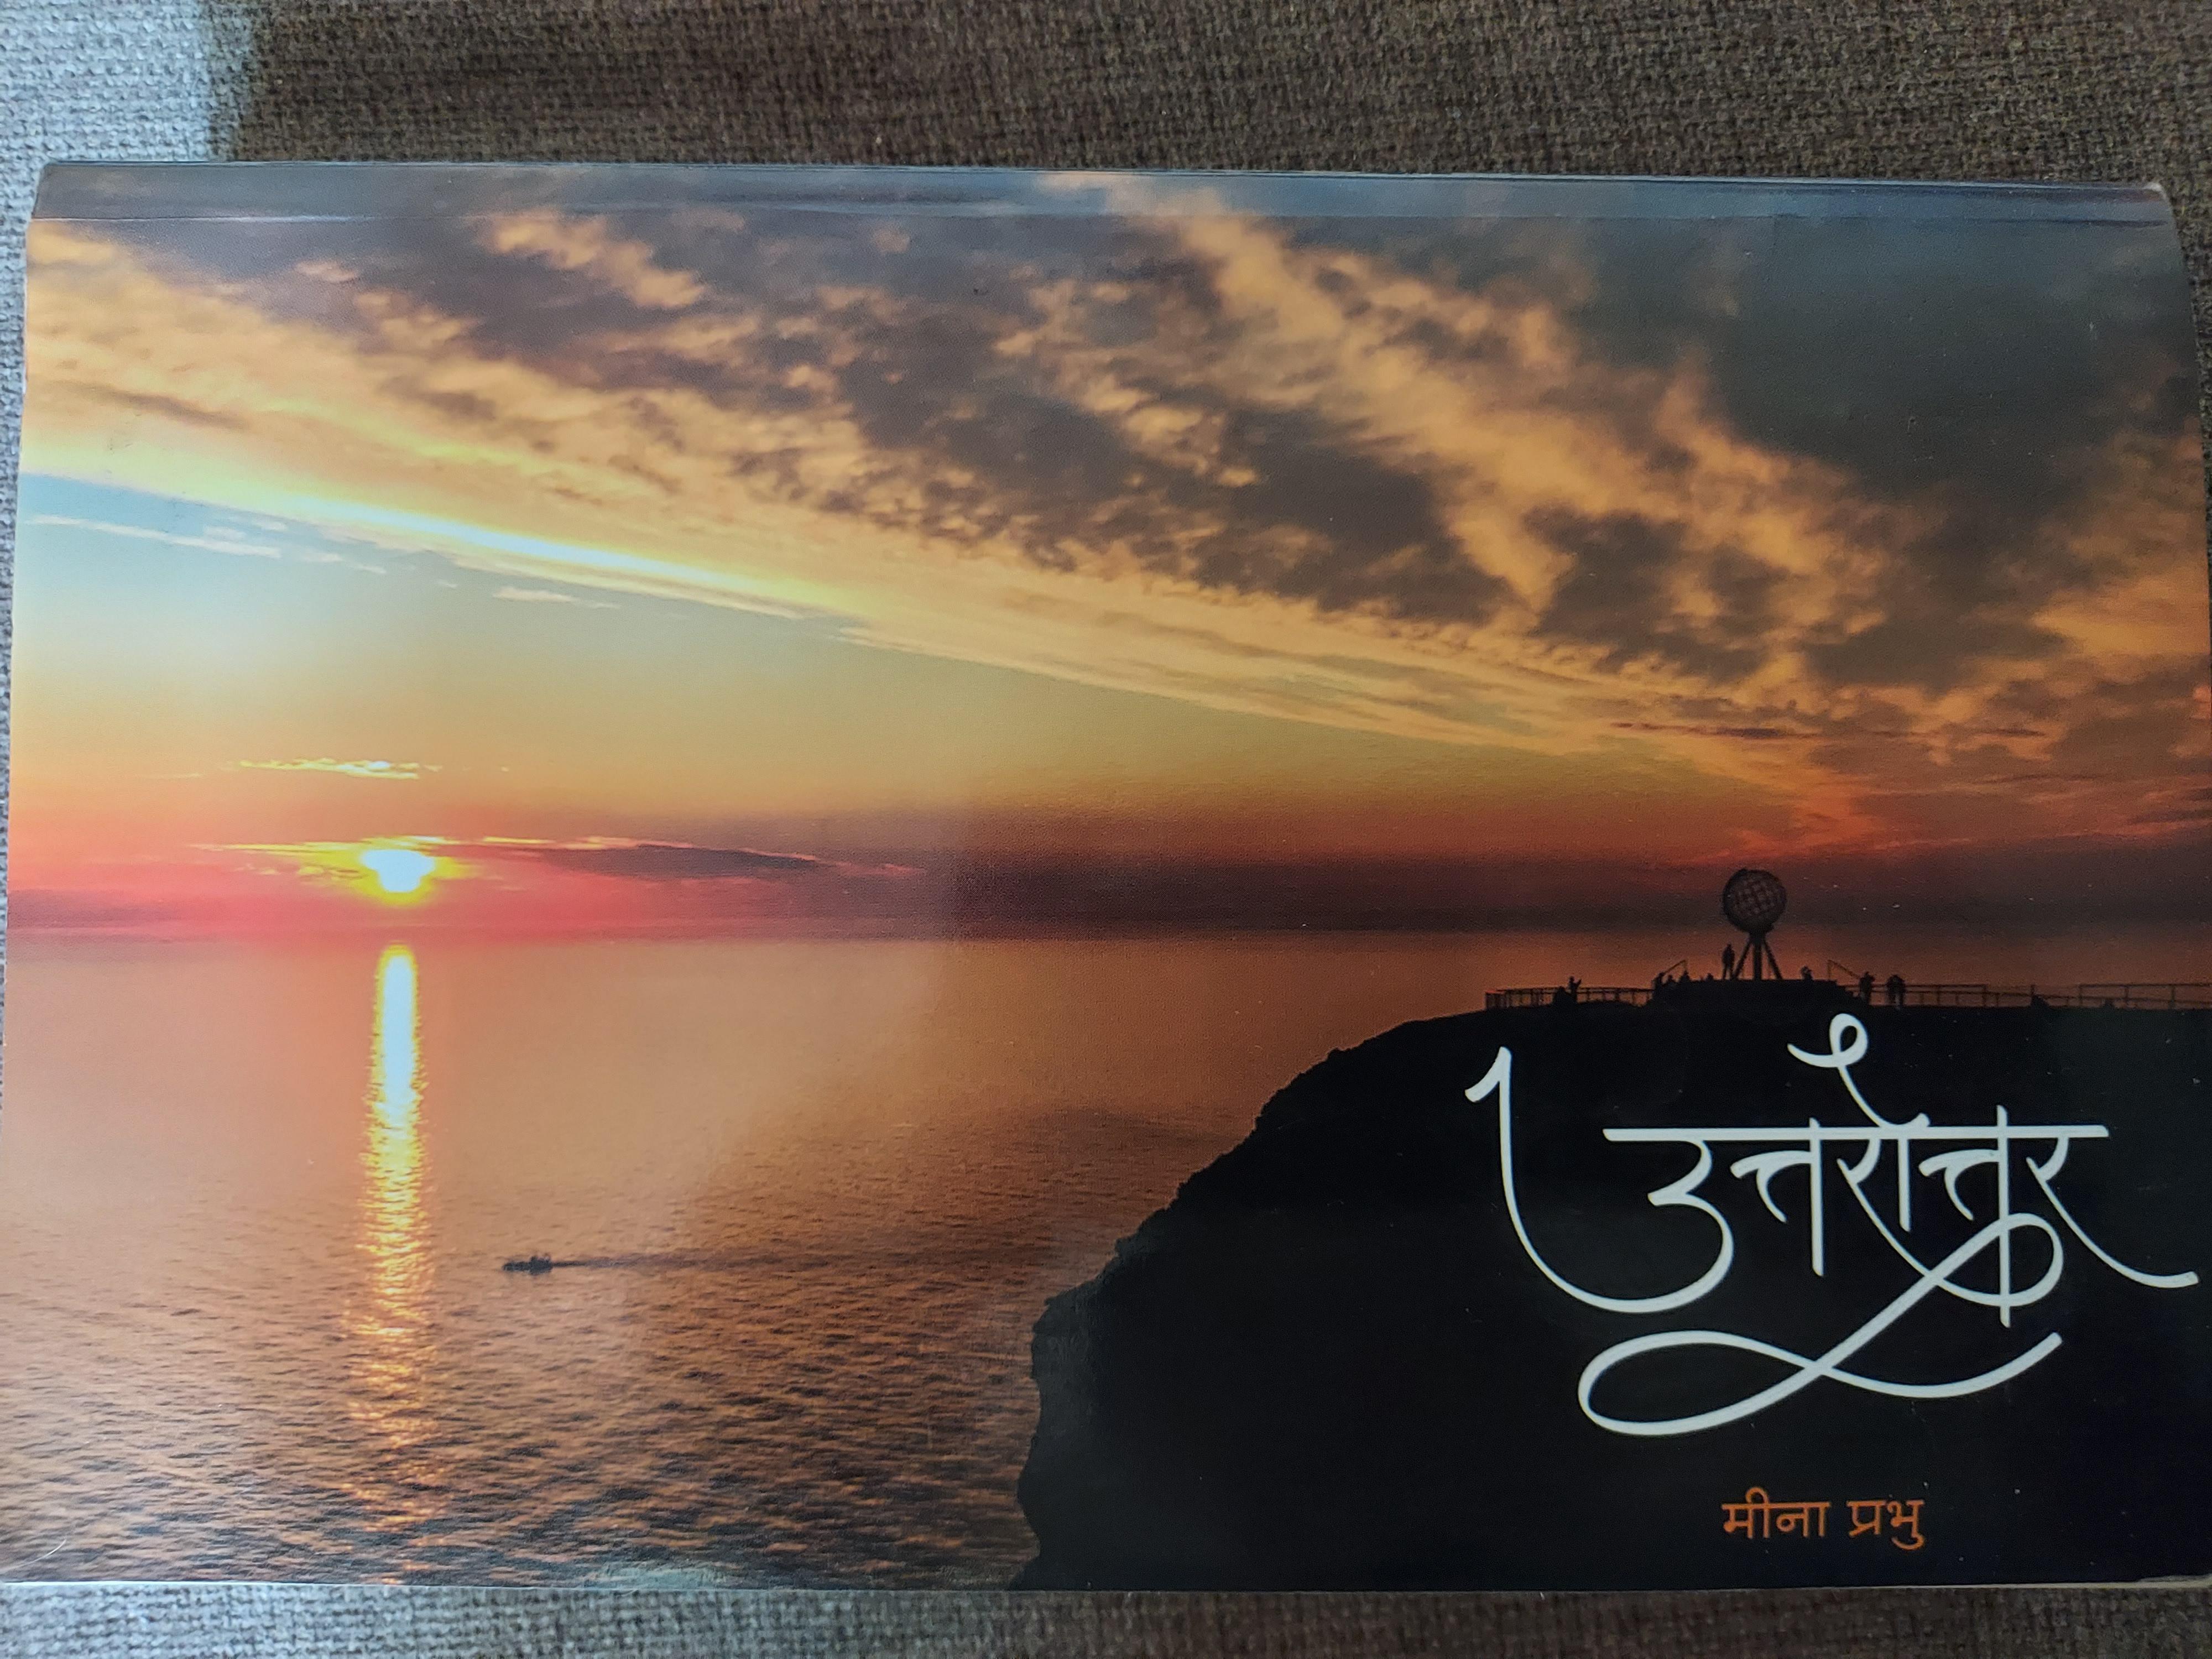 Uttarotar